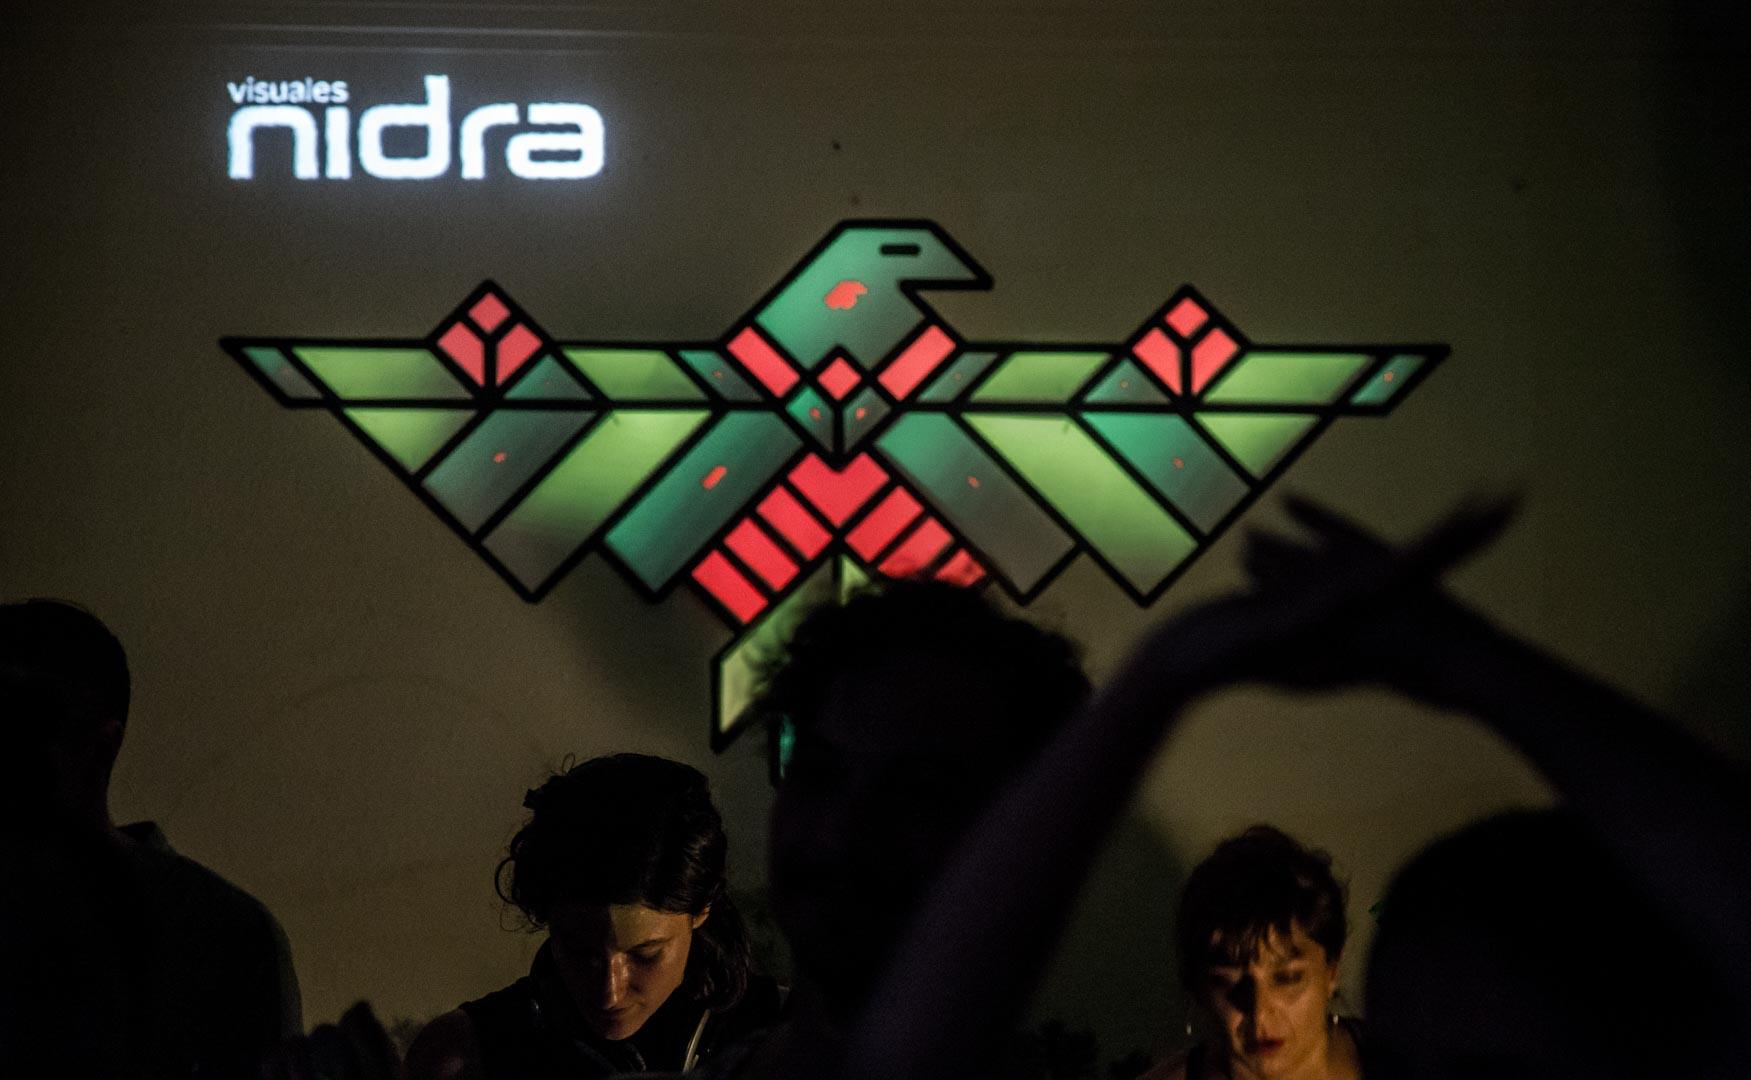 Icaro session Visuales Nidra